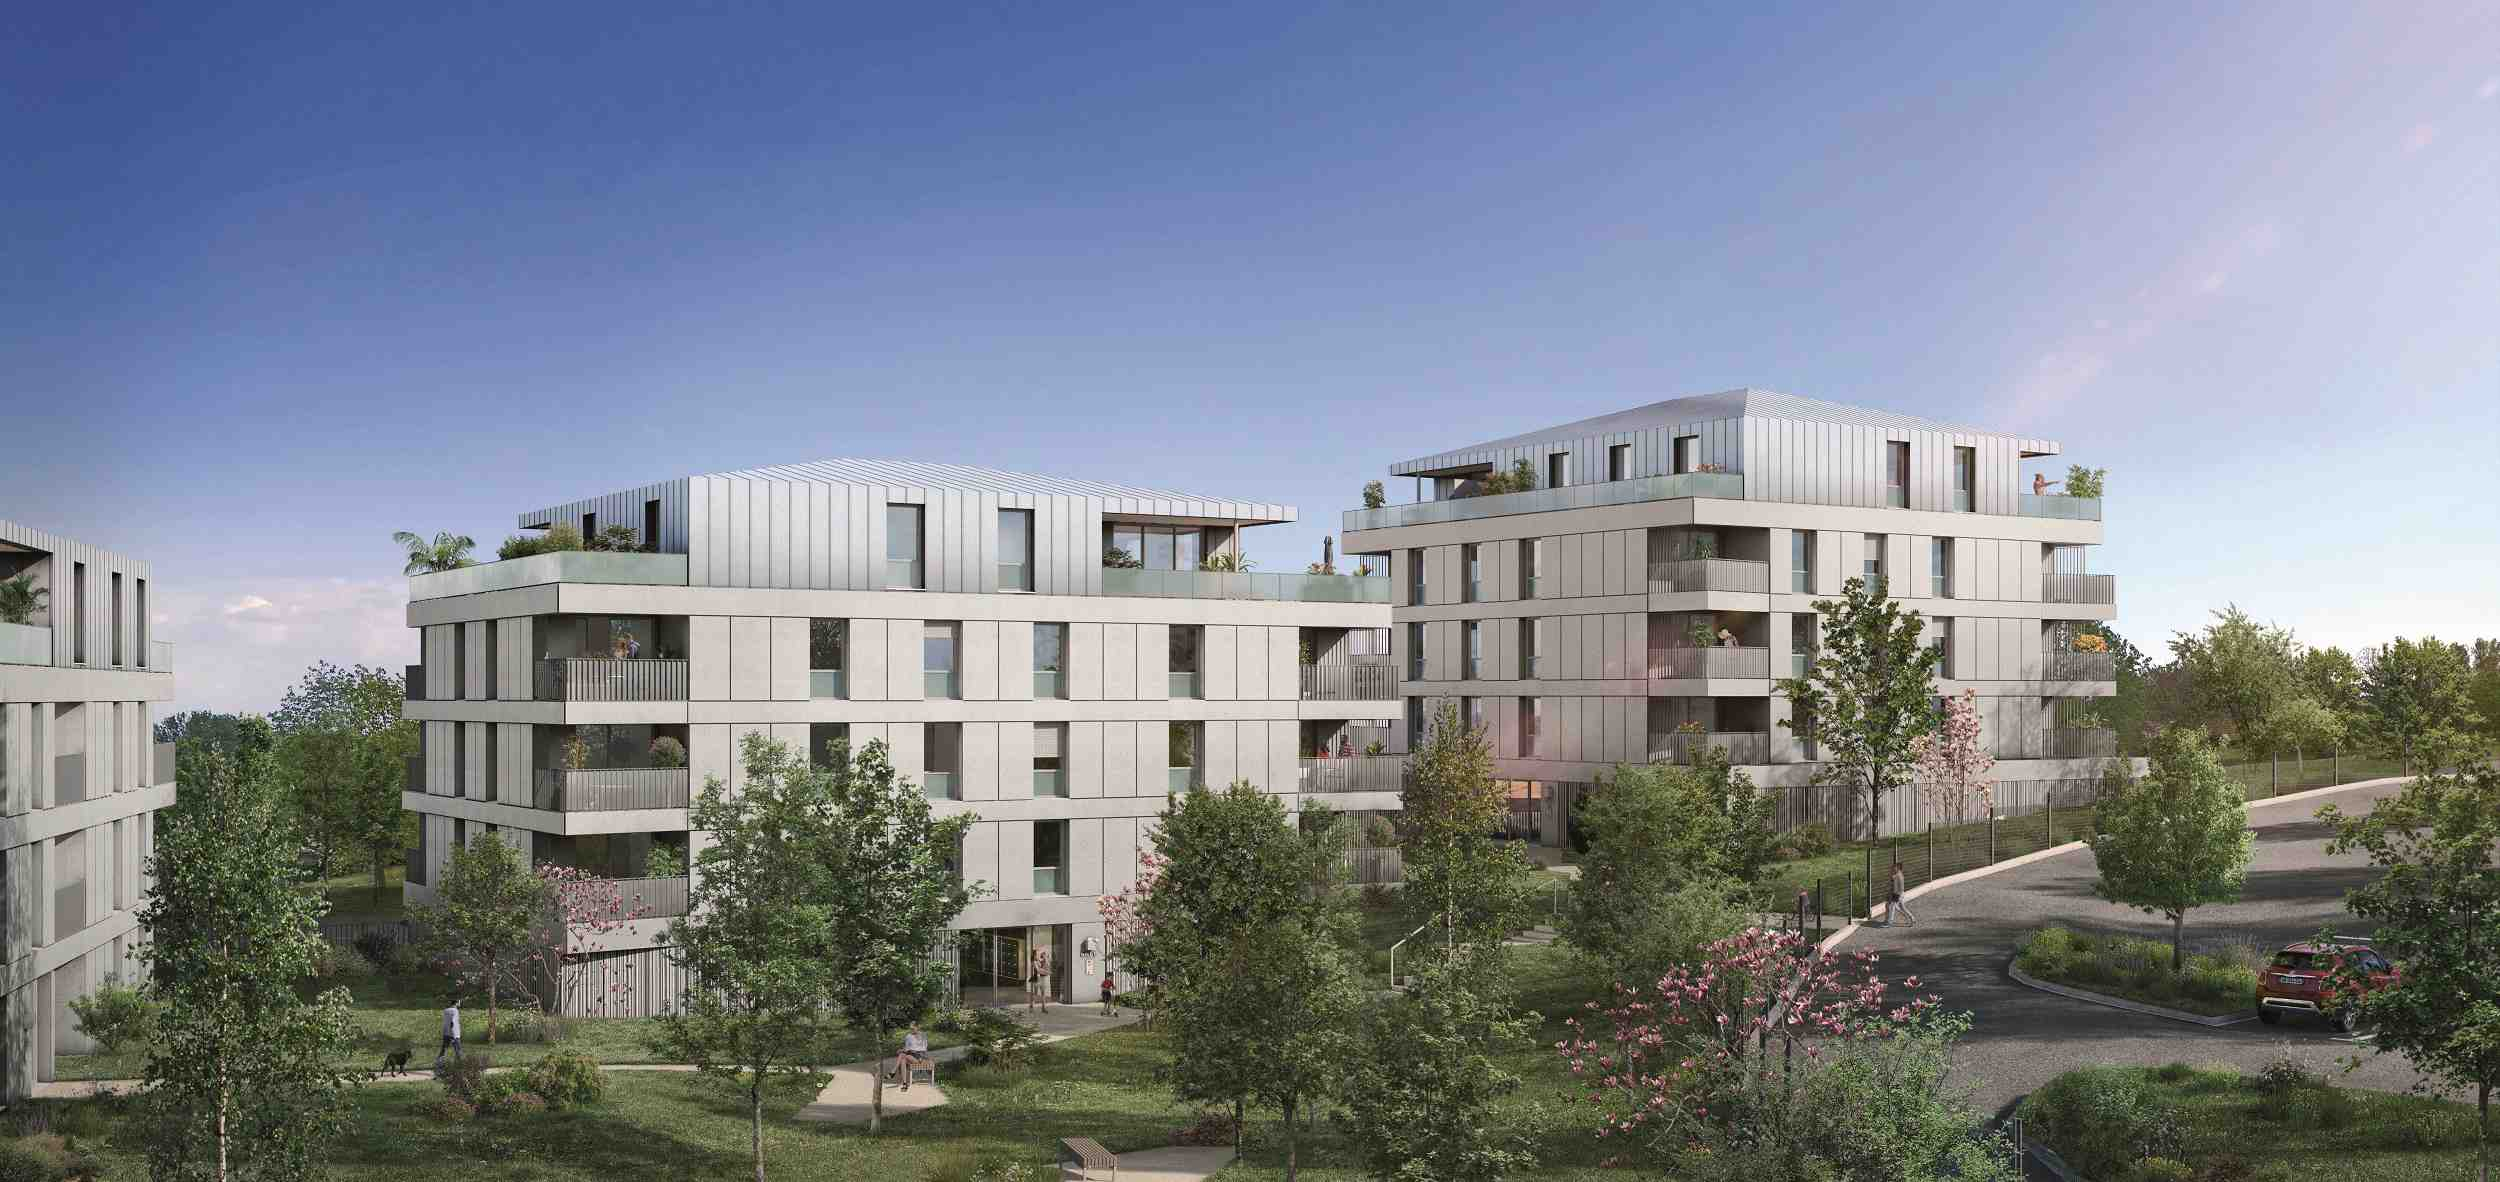 UrbanHouse360-JardinsdePouvourville-visuel